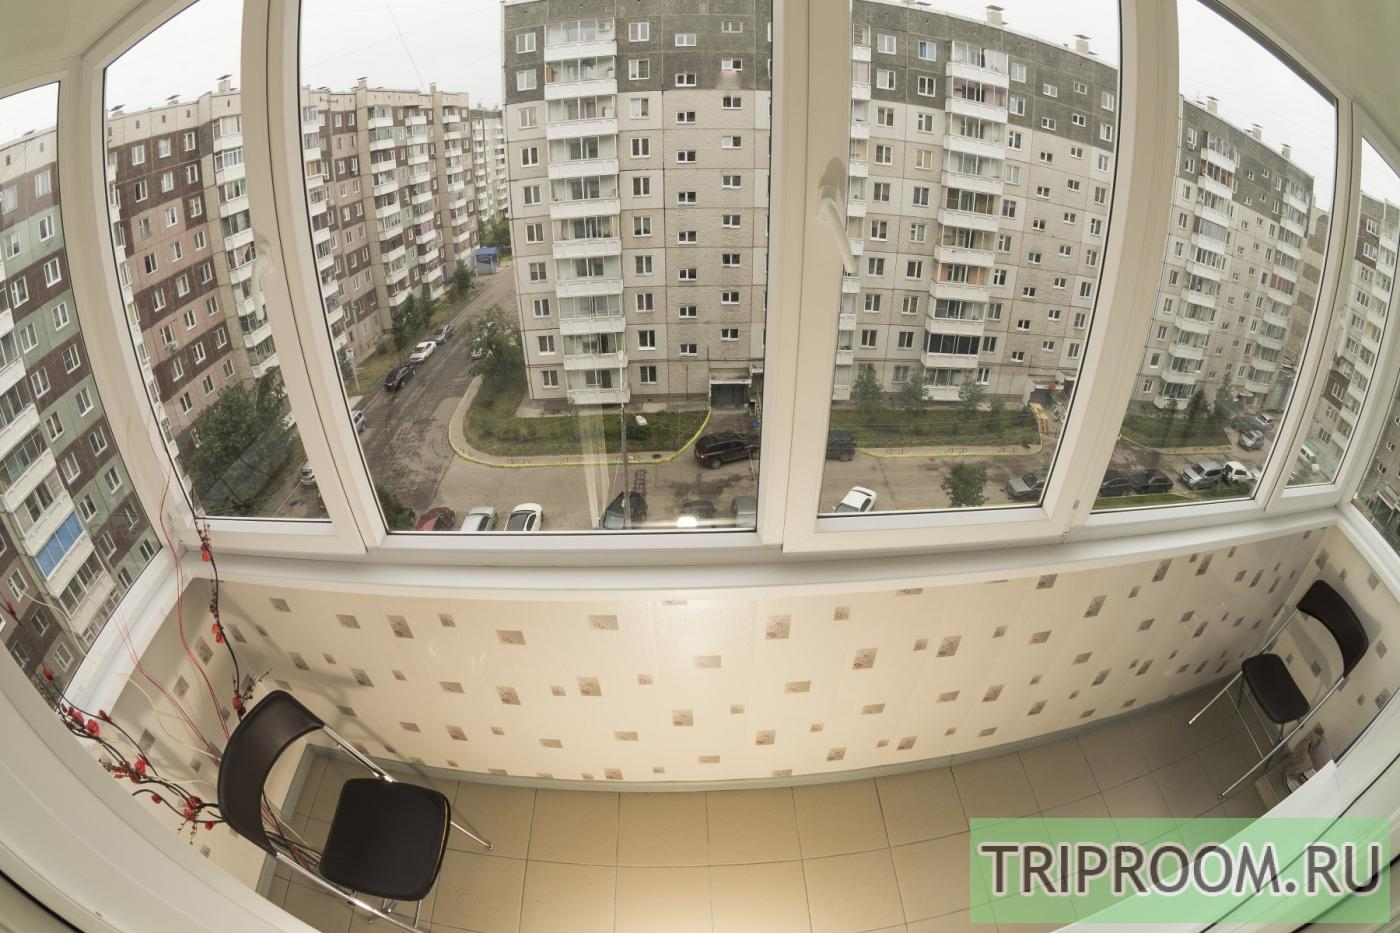 1-комнатная квартира посуточно (вариант № 20514), ул. Водопьянова улица, фото № 9